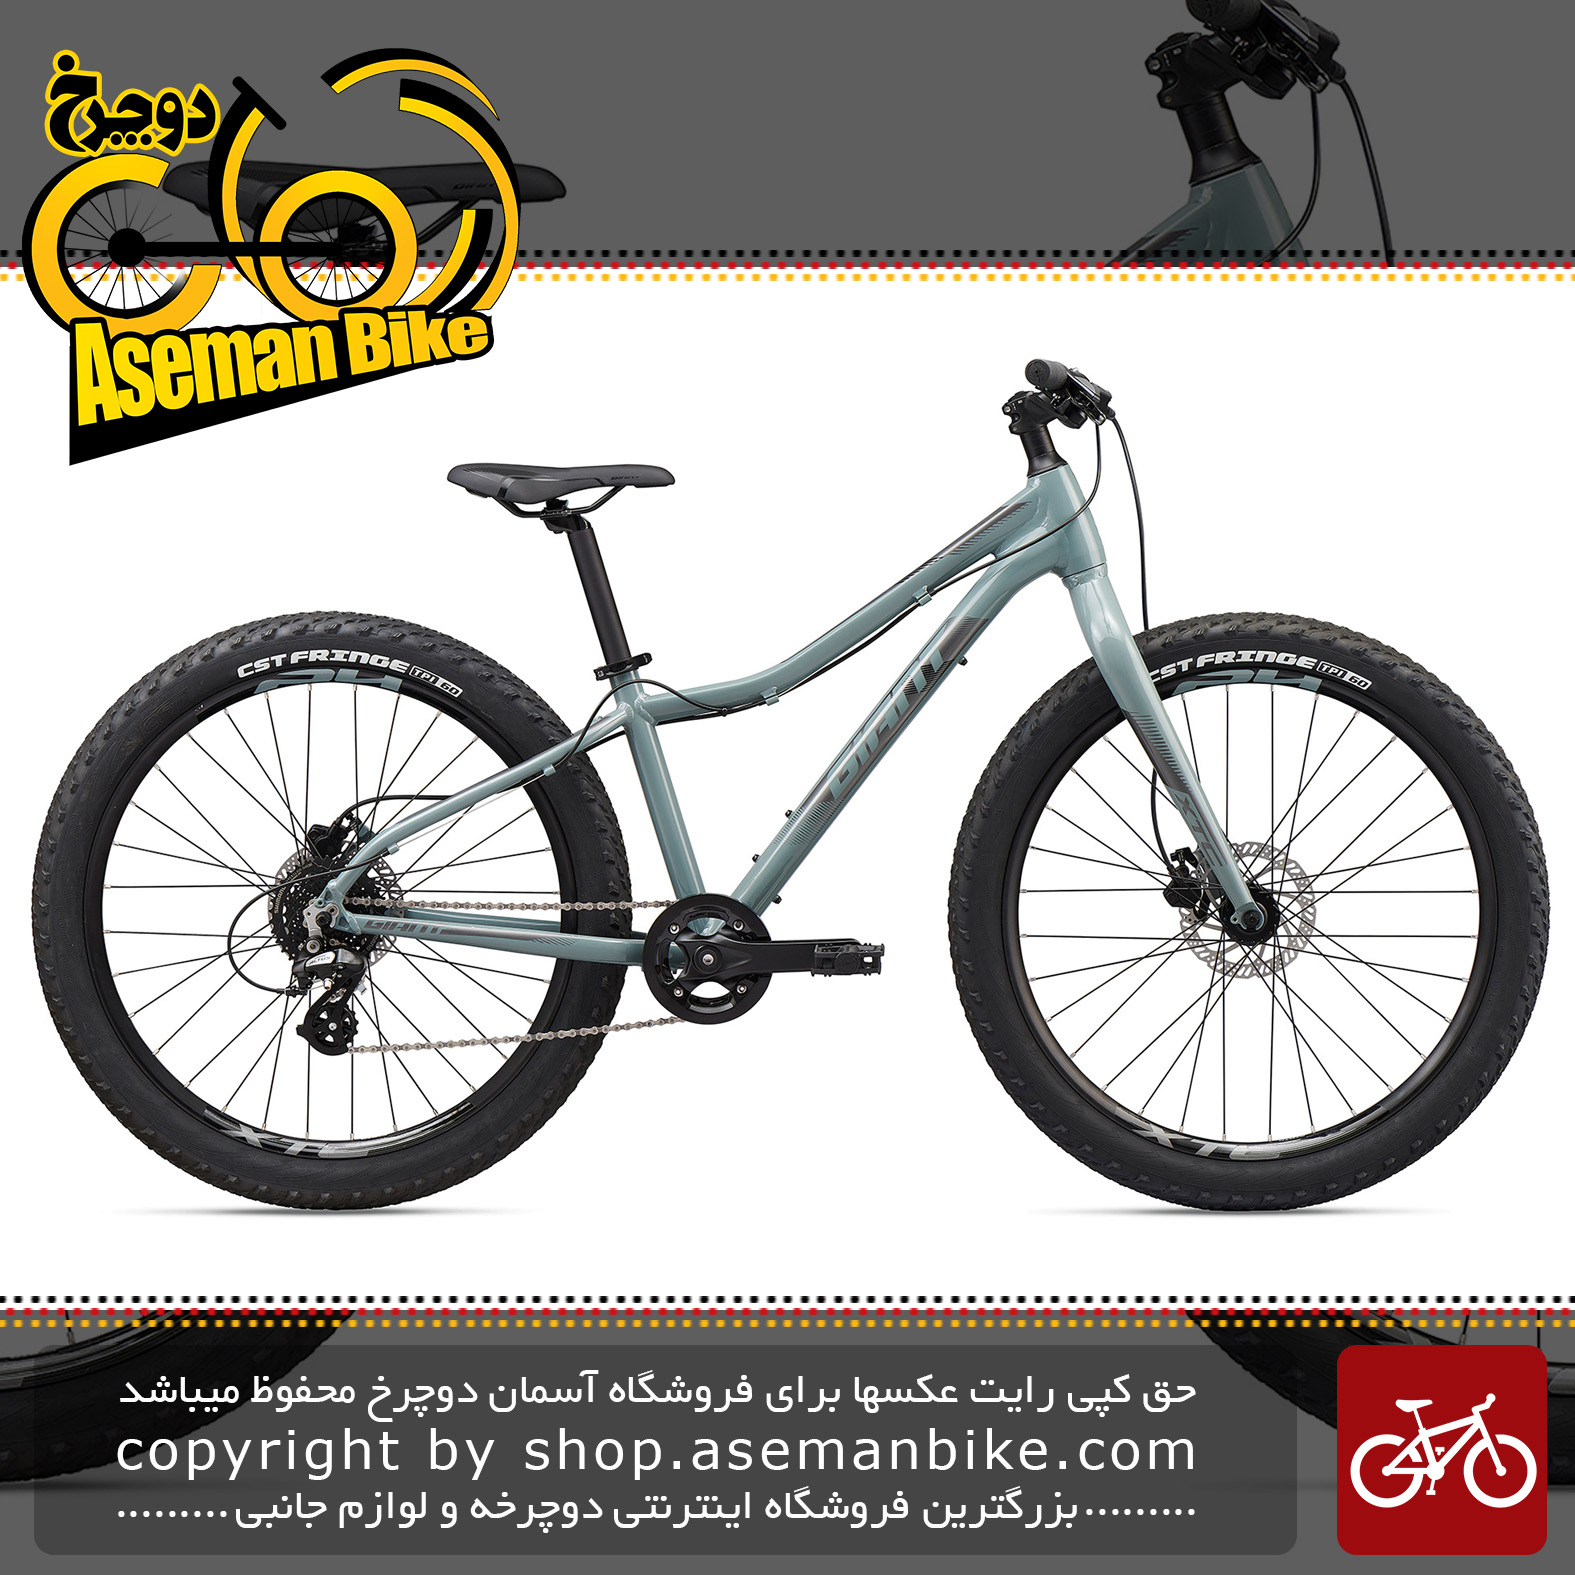 دوچرخه کوهستان جاینت مدل ترنس جی آر 26 اینچ پلاس 2020 Giant Mountain Bicycle XTC Jr 26 + 2020